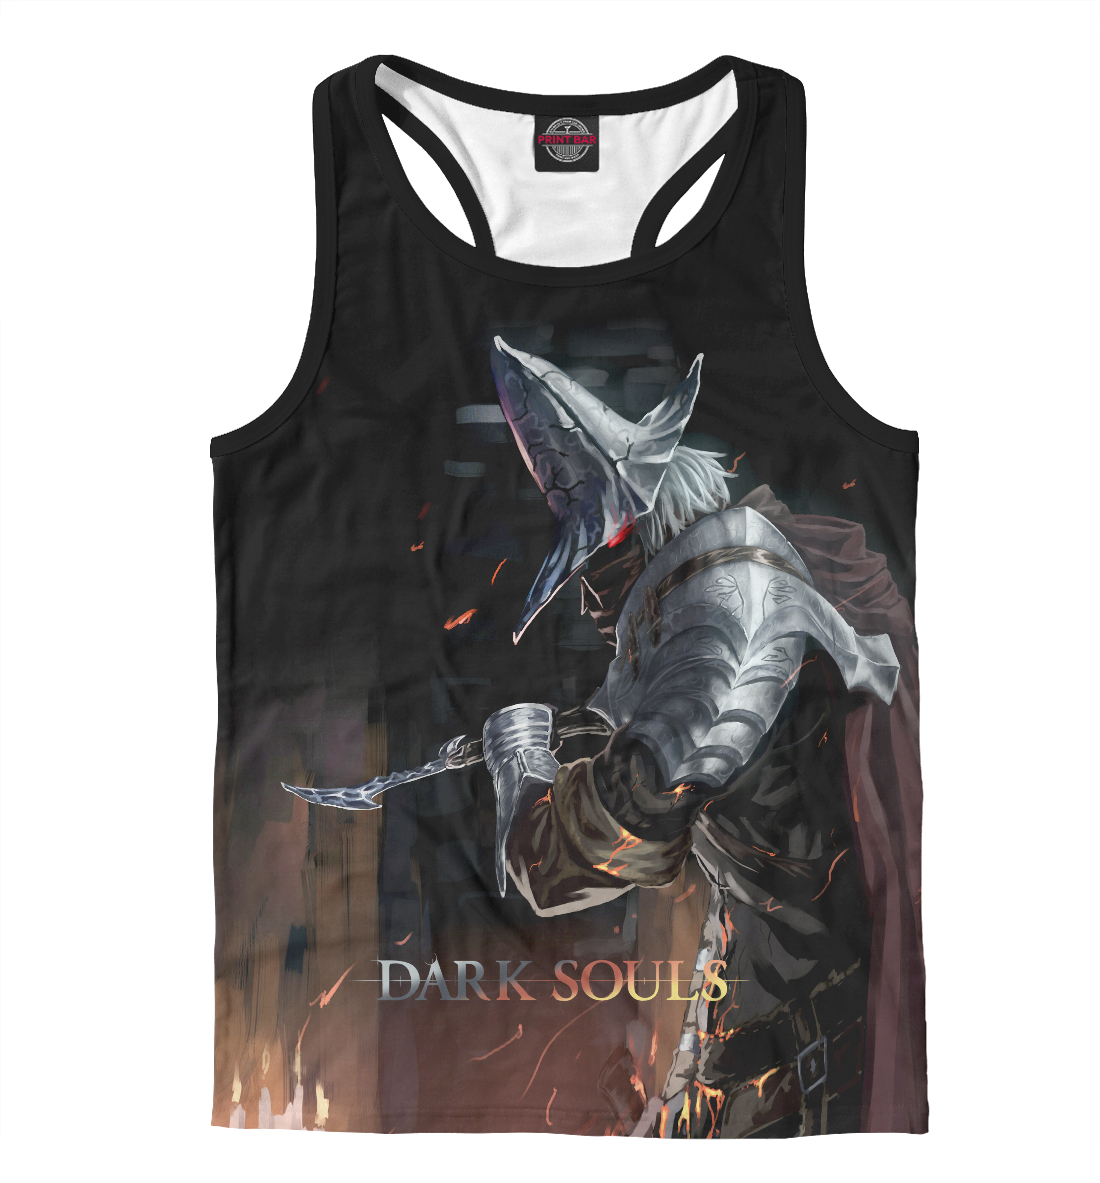 Купить Dark Souls, Printbar, Майки борцовки, DKS-831327-mayb-2